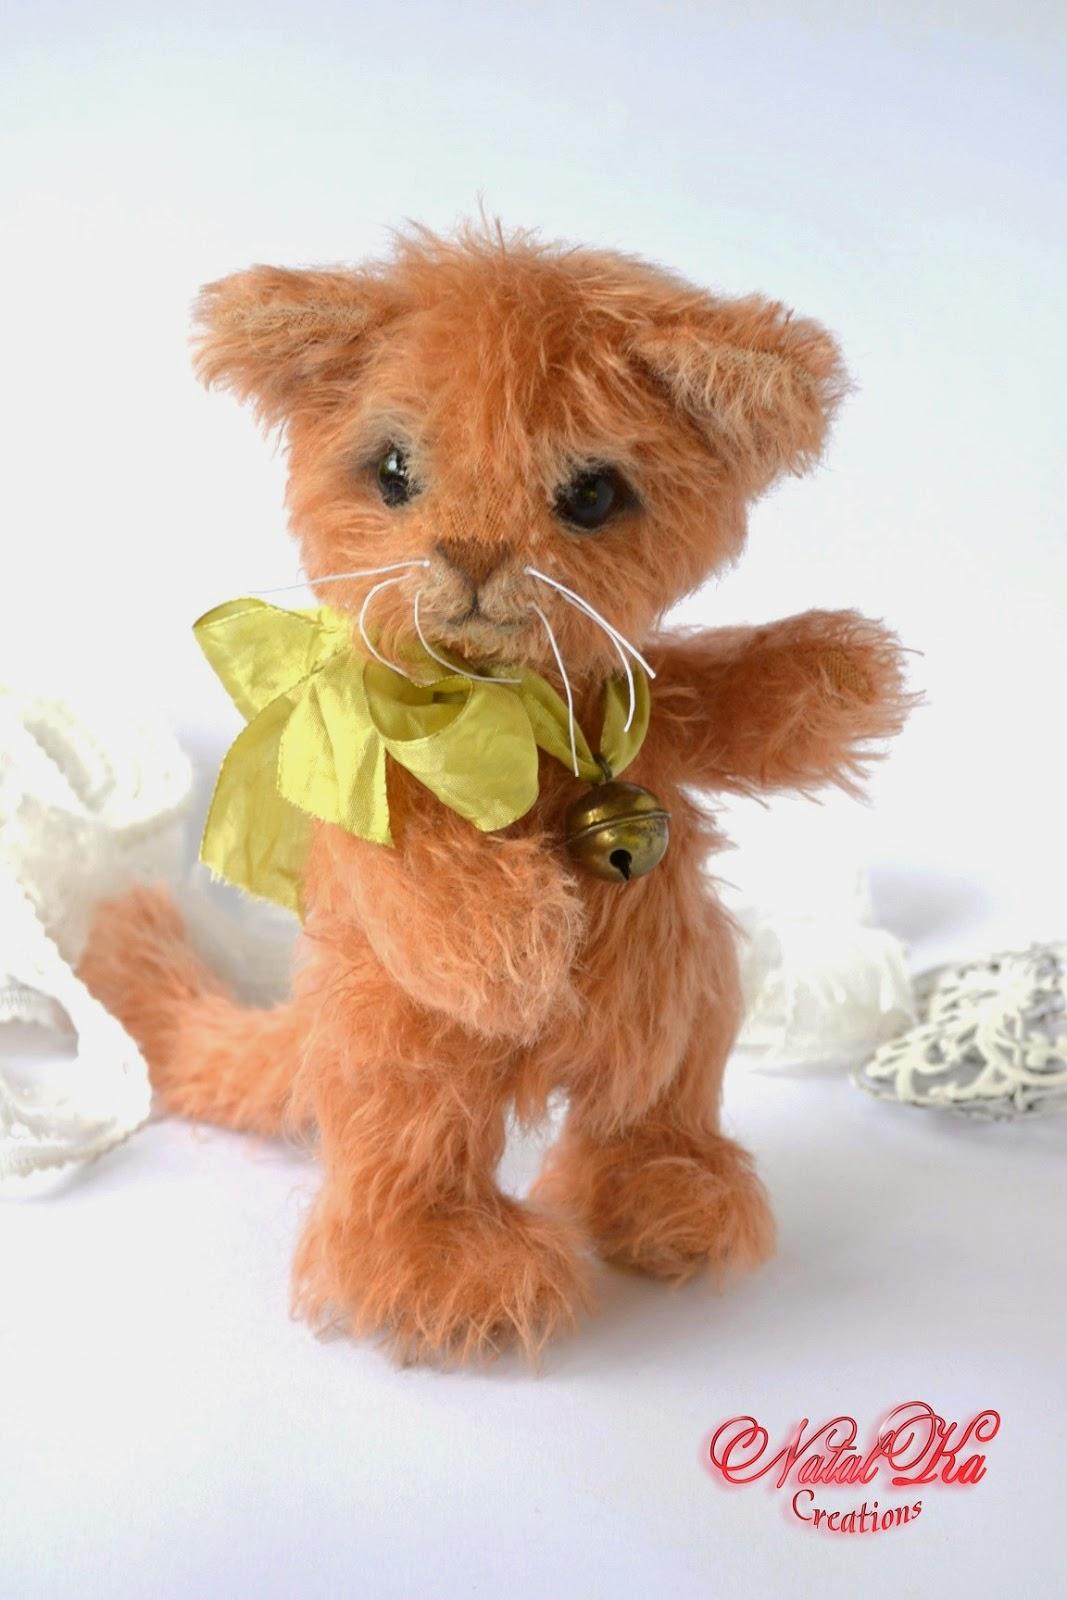 Artist teddy cat handmade by Natalka Creations.